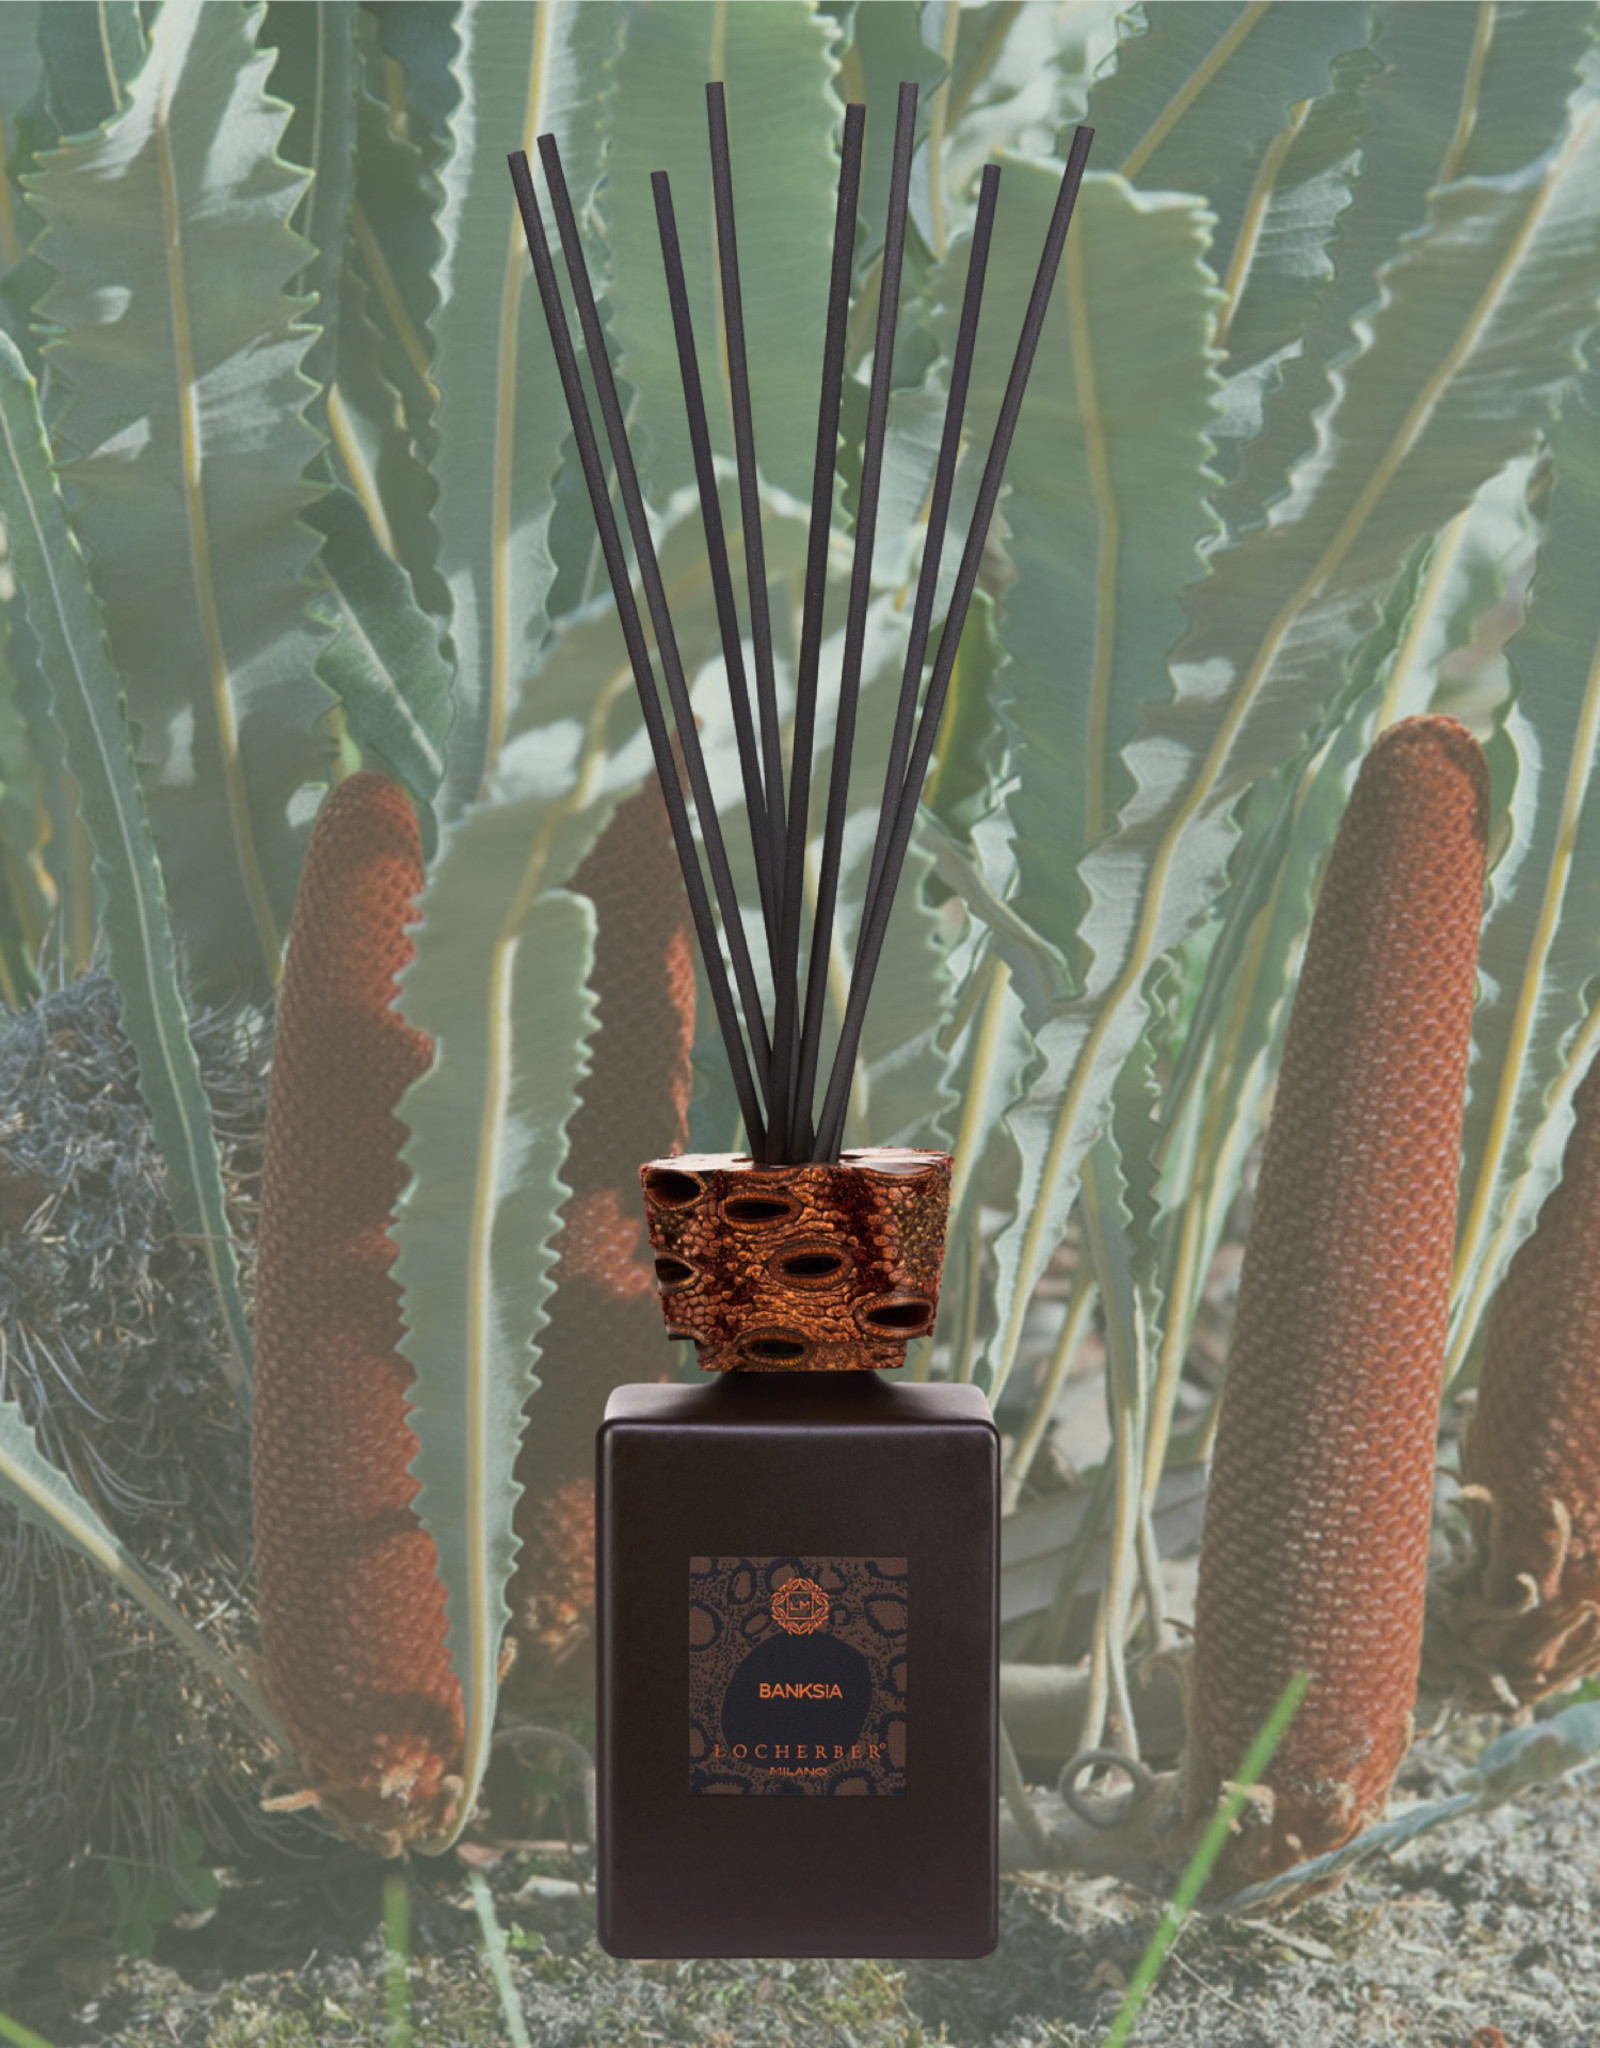 Locherber Locherber Milano - Banksai - Gift Box